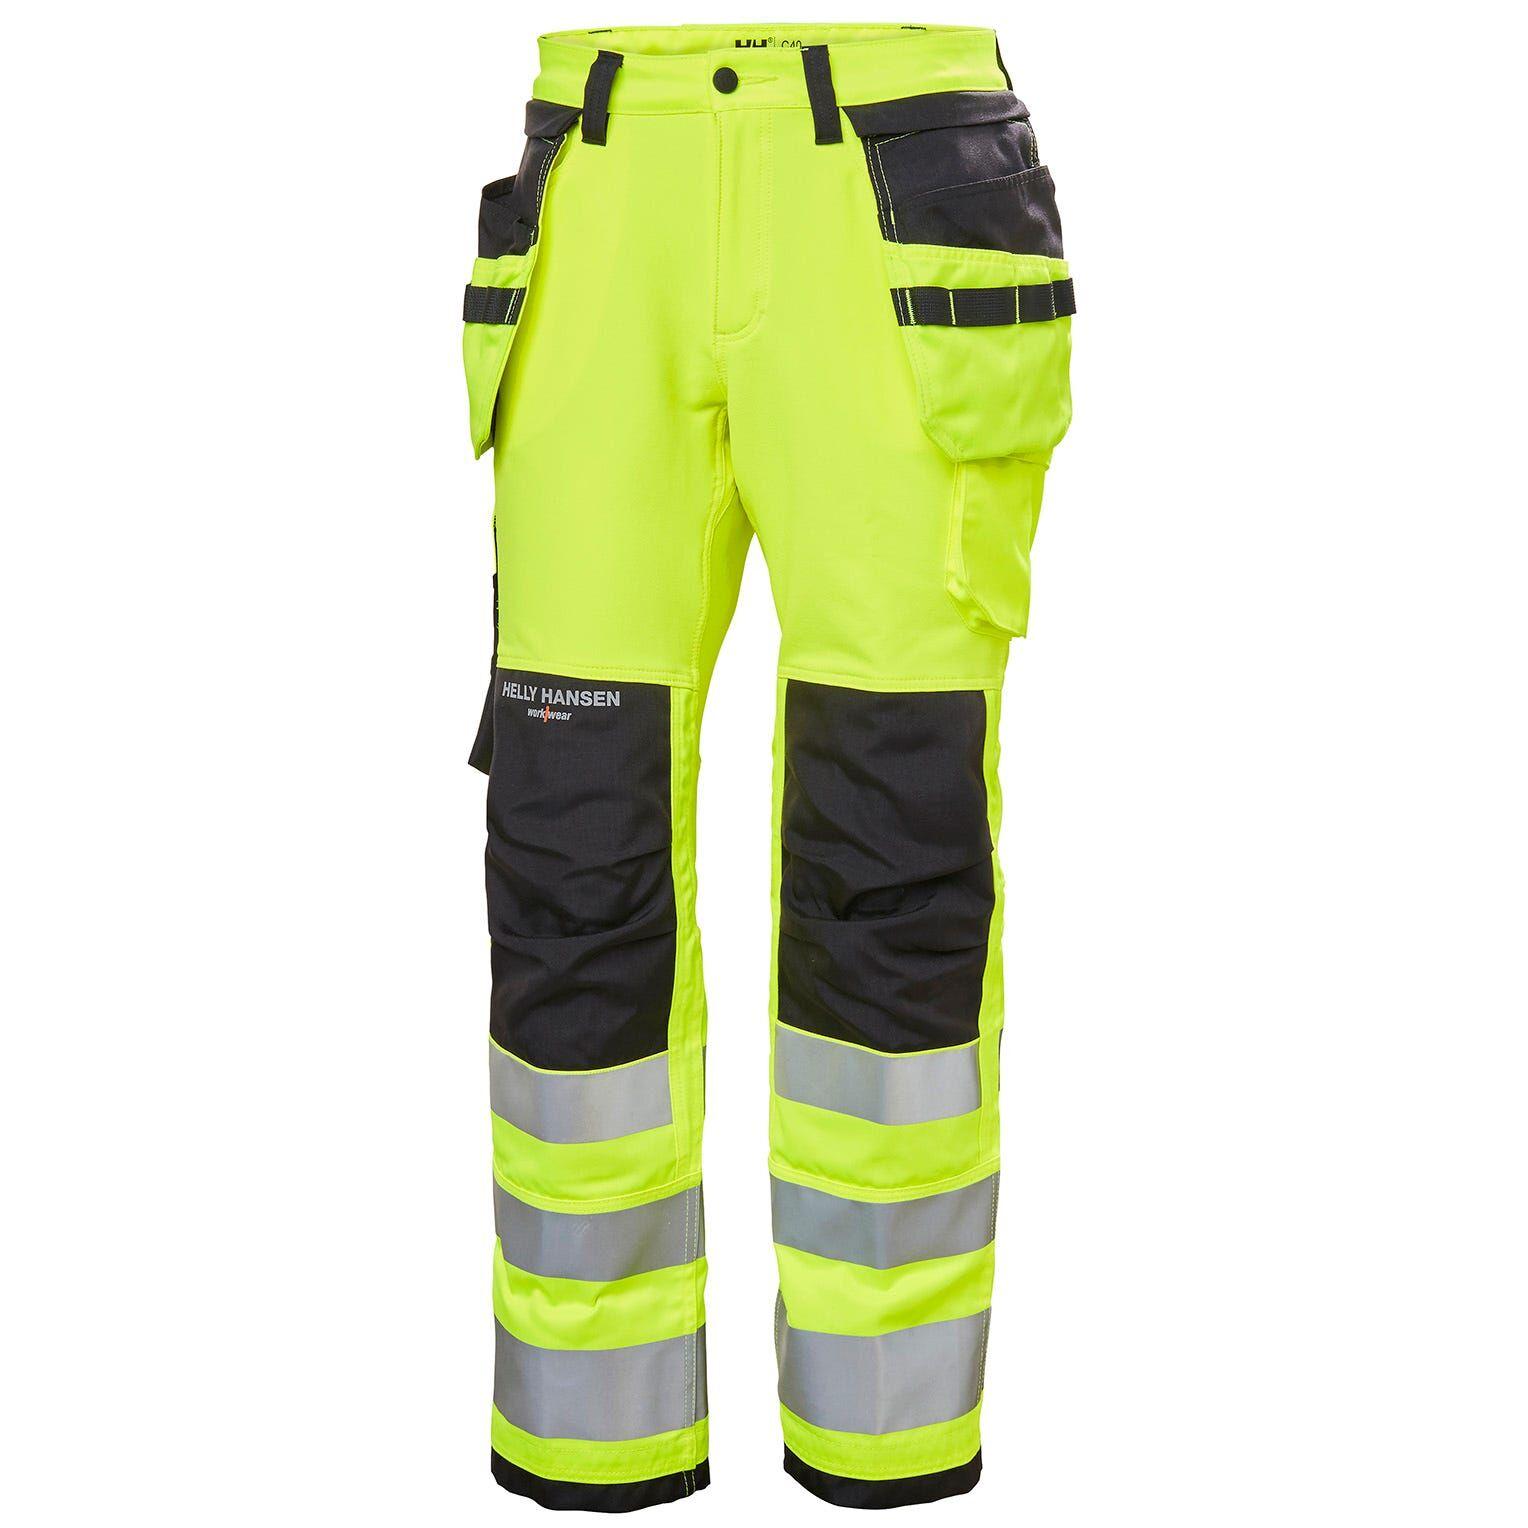 HH Workwear Workwear Helly Hansen Women's Luna Alta Visibilità Construction Pant Cl 2 C38 Giallo